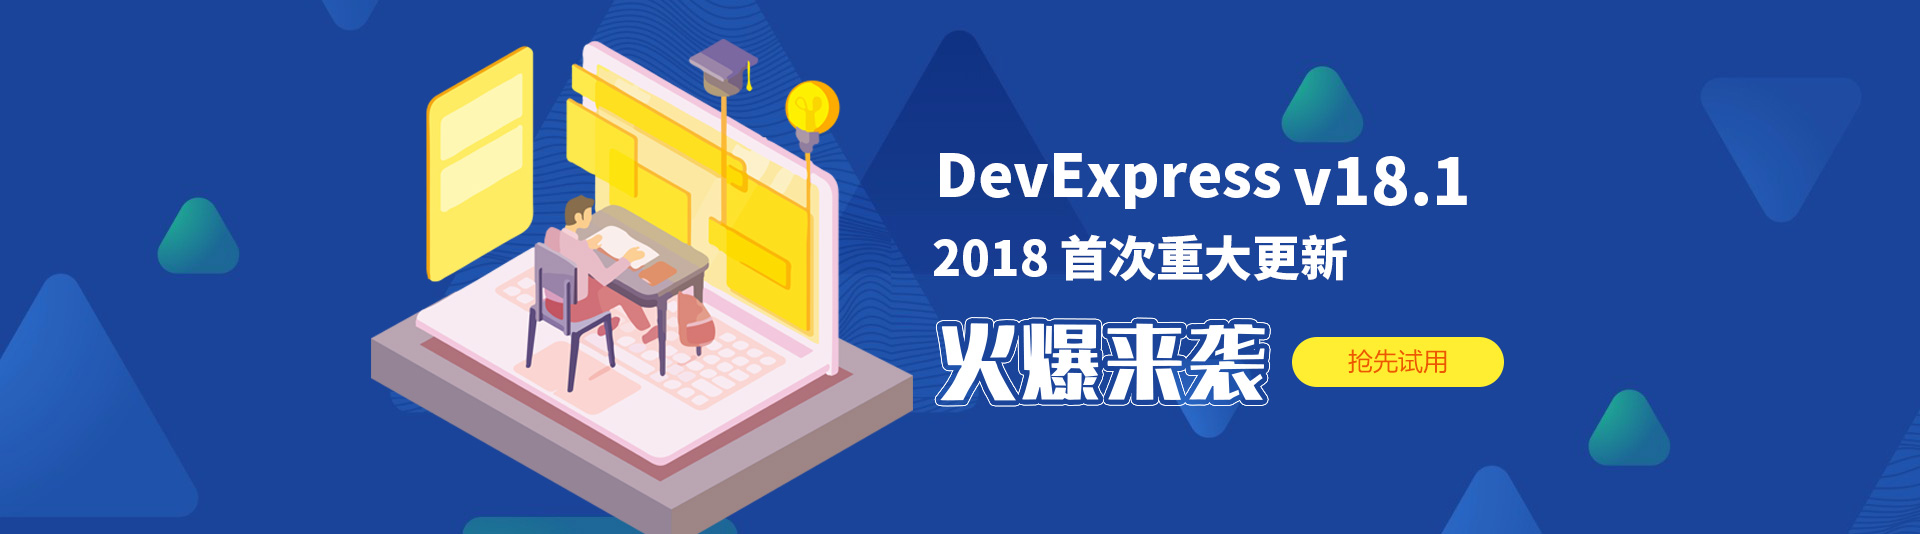 DevExpress v18.1全新发布